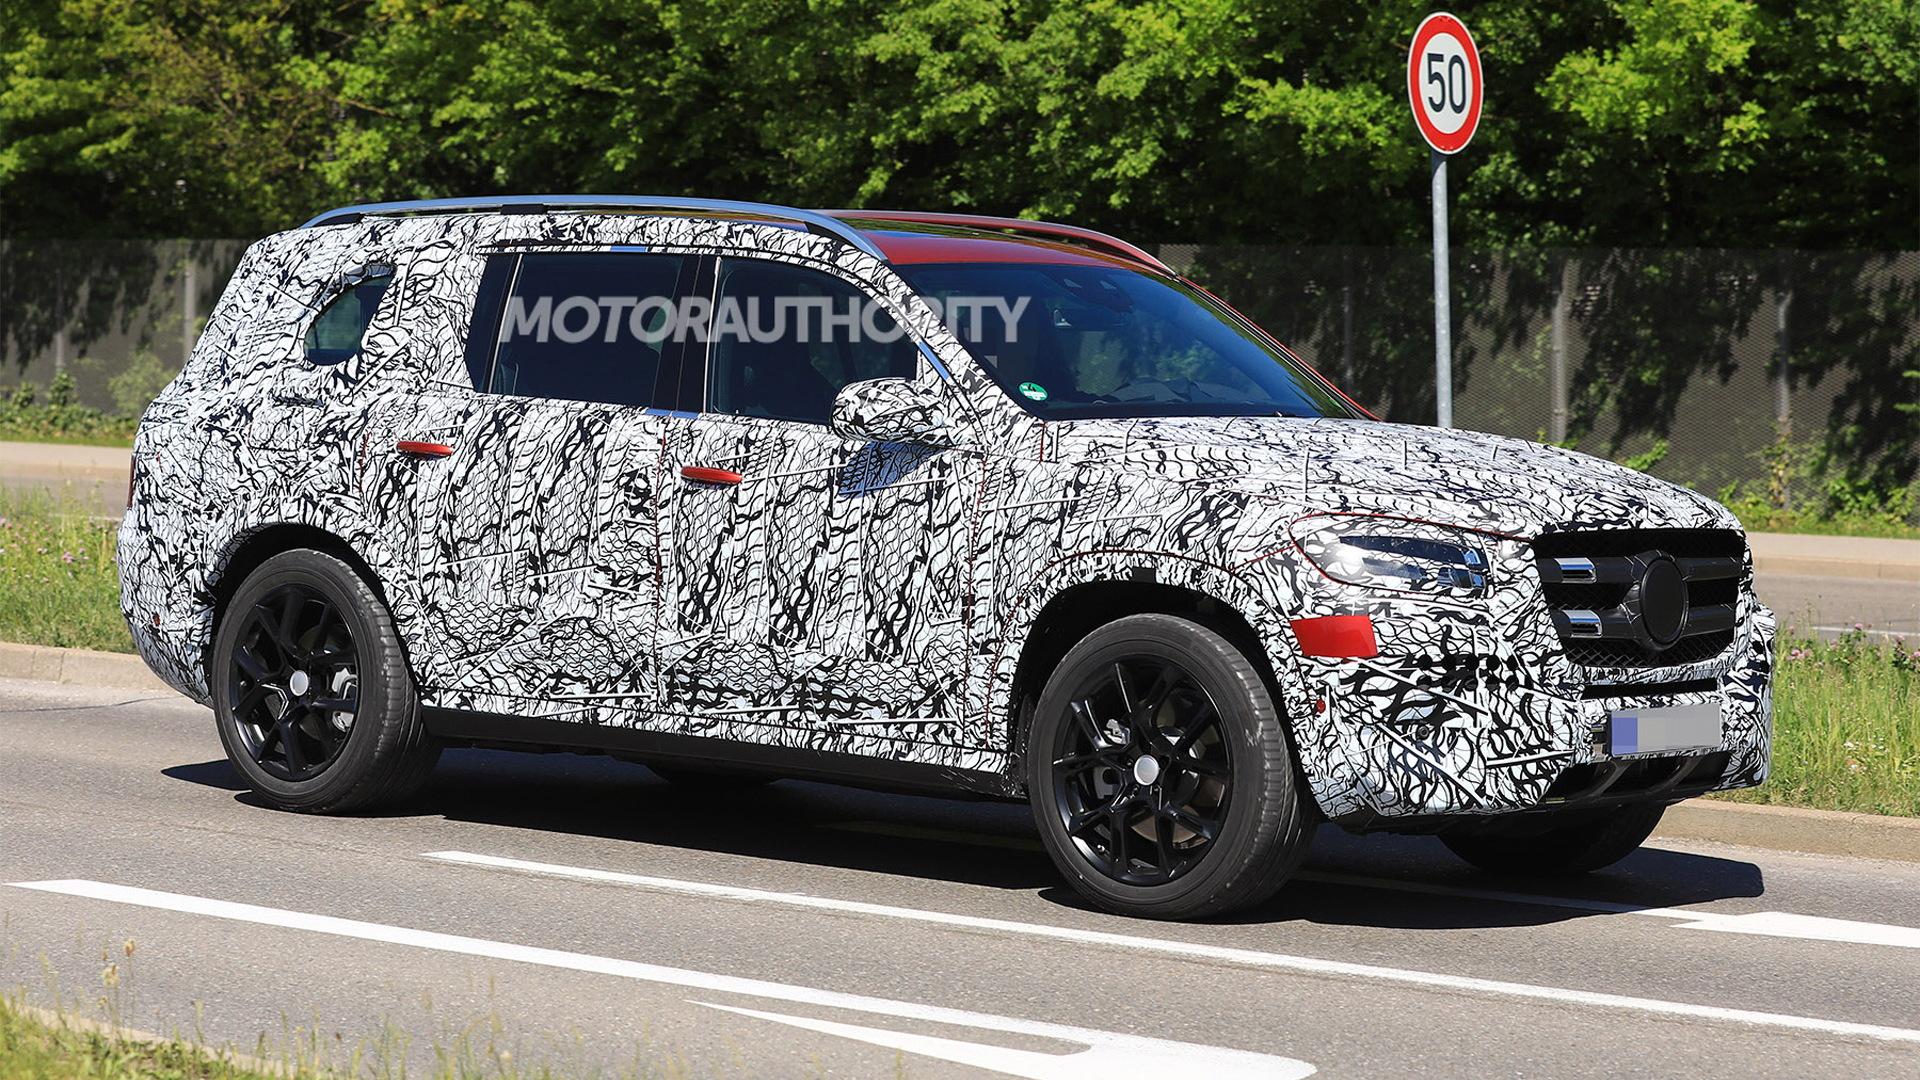 2020 Mercedes-Benz GLS spy shots - Image via S. Baldauf/SB-Medien